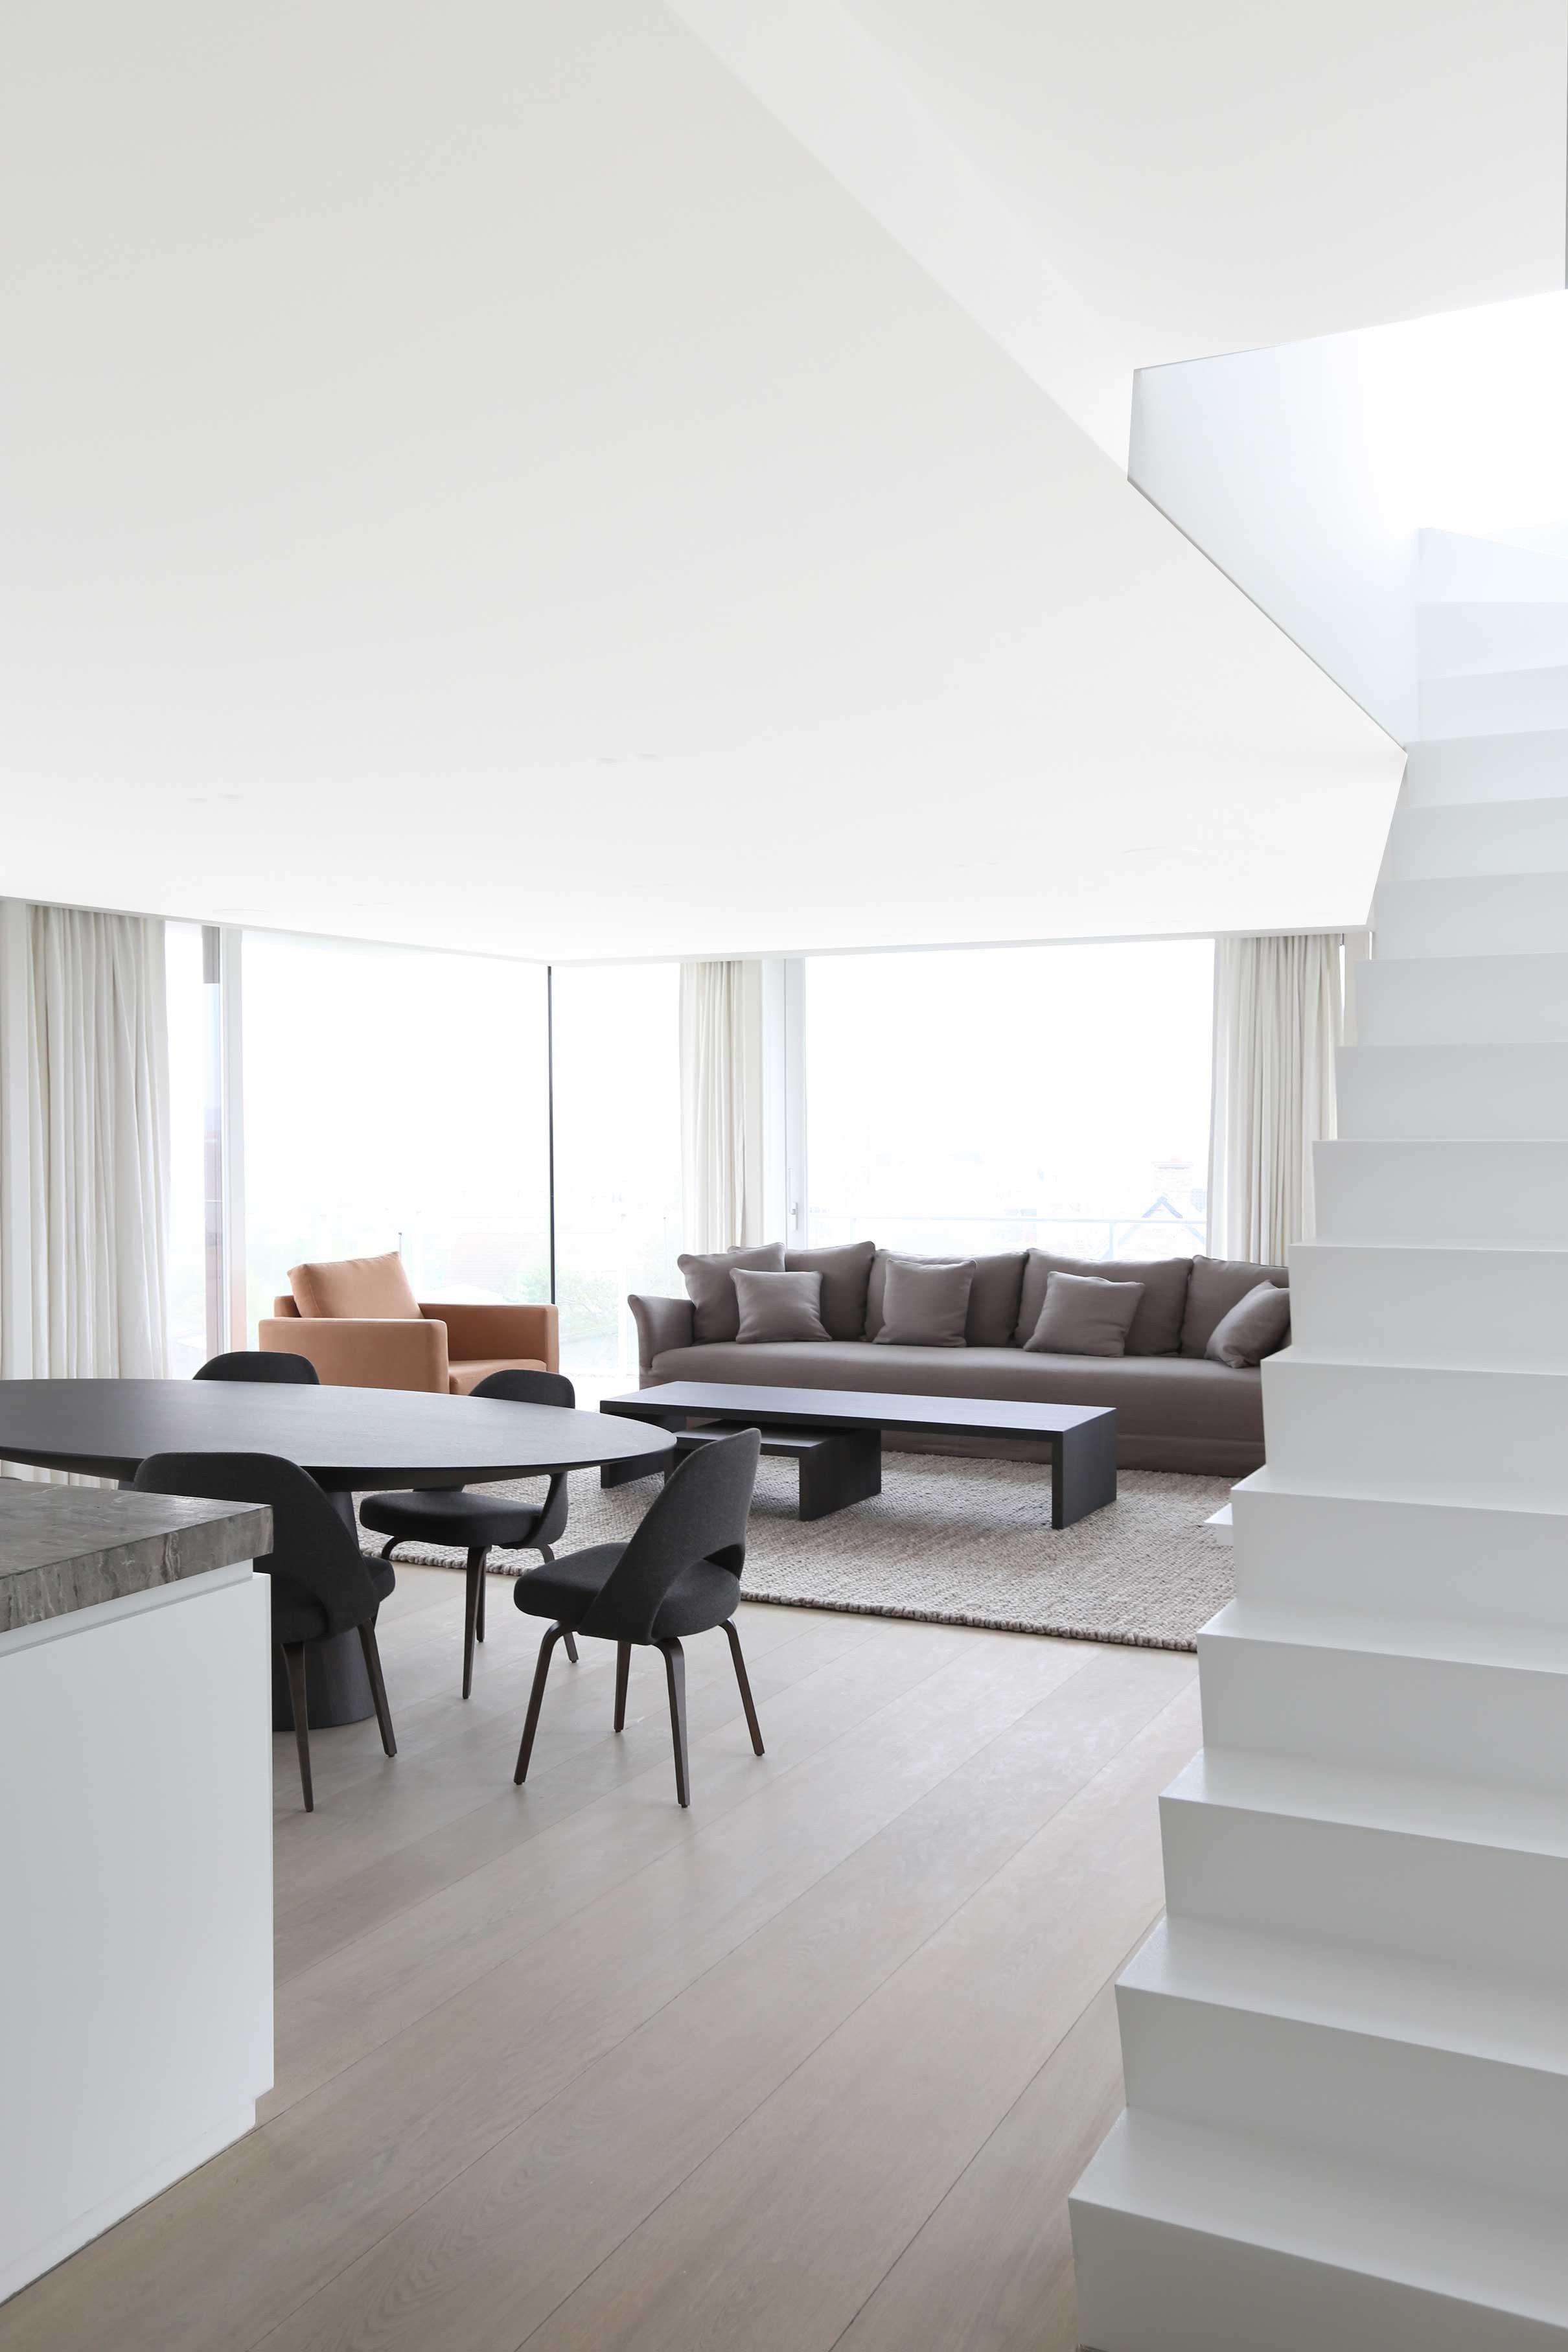 Rietveldprojects.be-ArneJ-duinen-design-architectuur-kust19.jpg